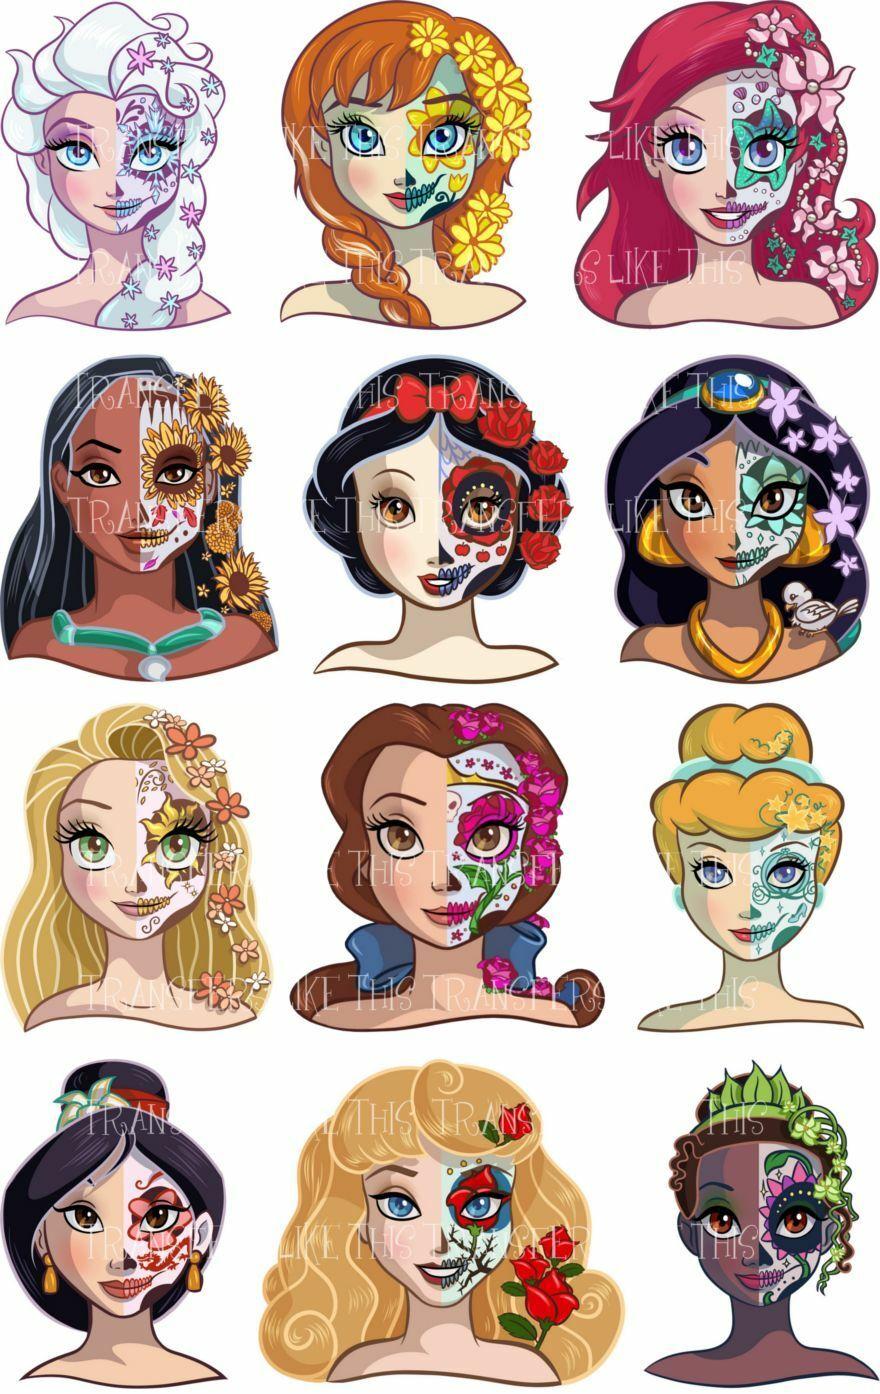 Cool Kawaii Dessin Disney Princesse Facile - Bethwyns Project